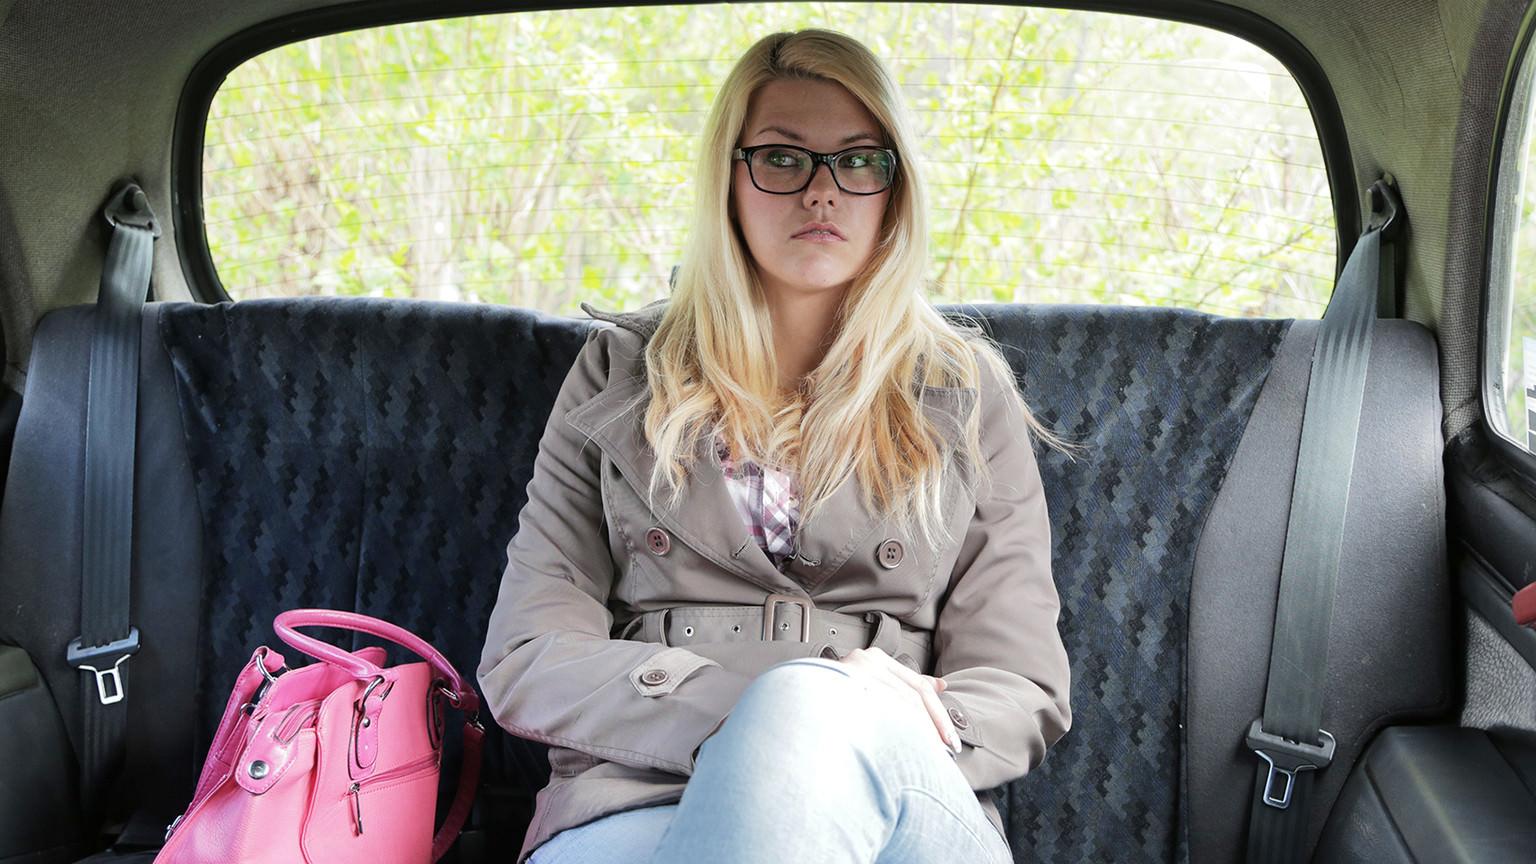 Backseat Rim Job and Hard Fucking - Fake Taxi